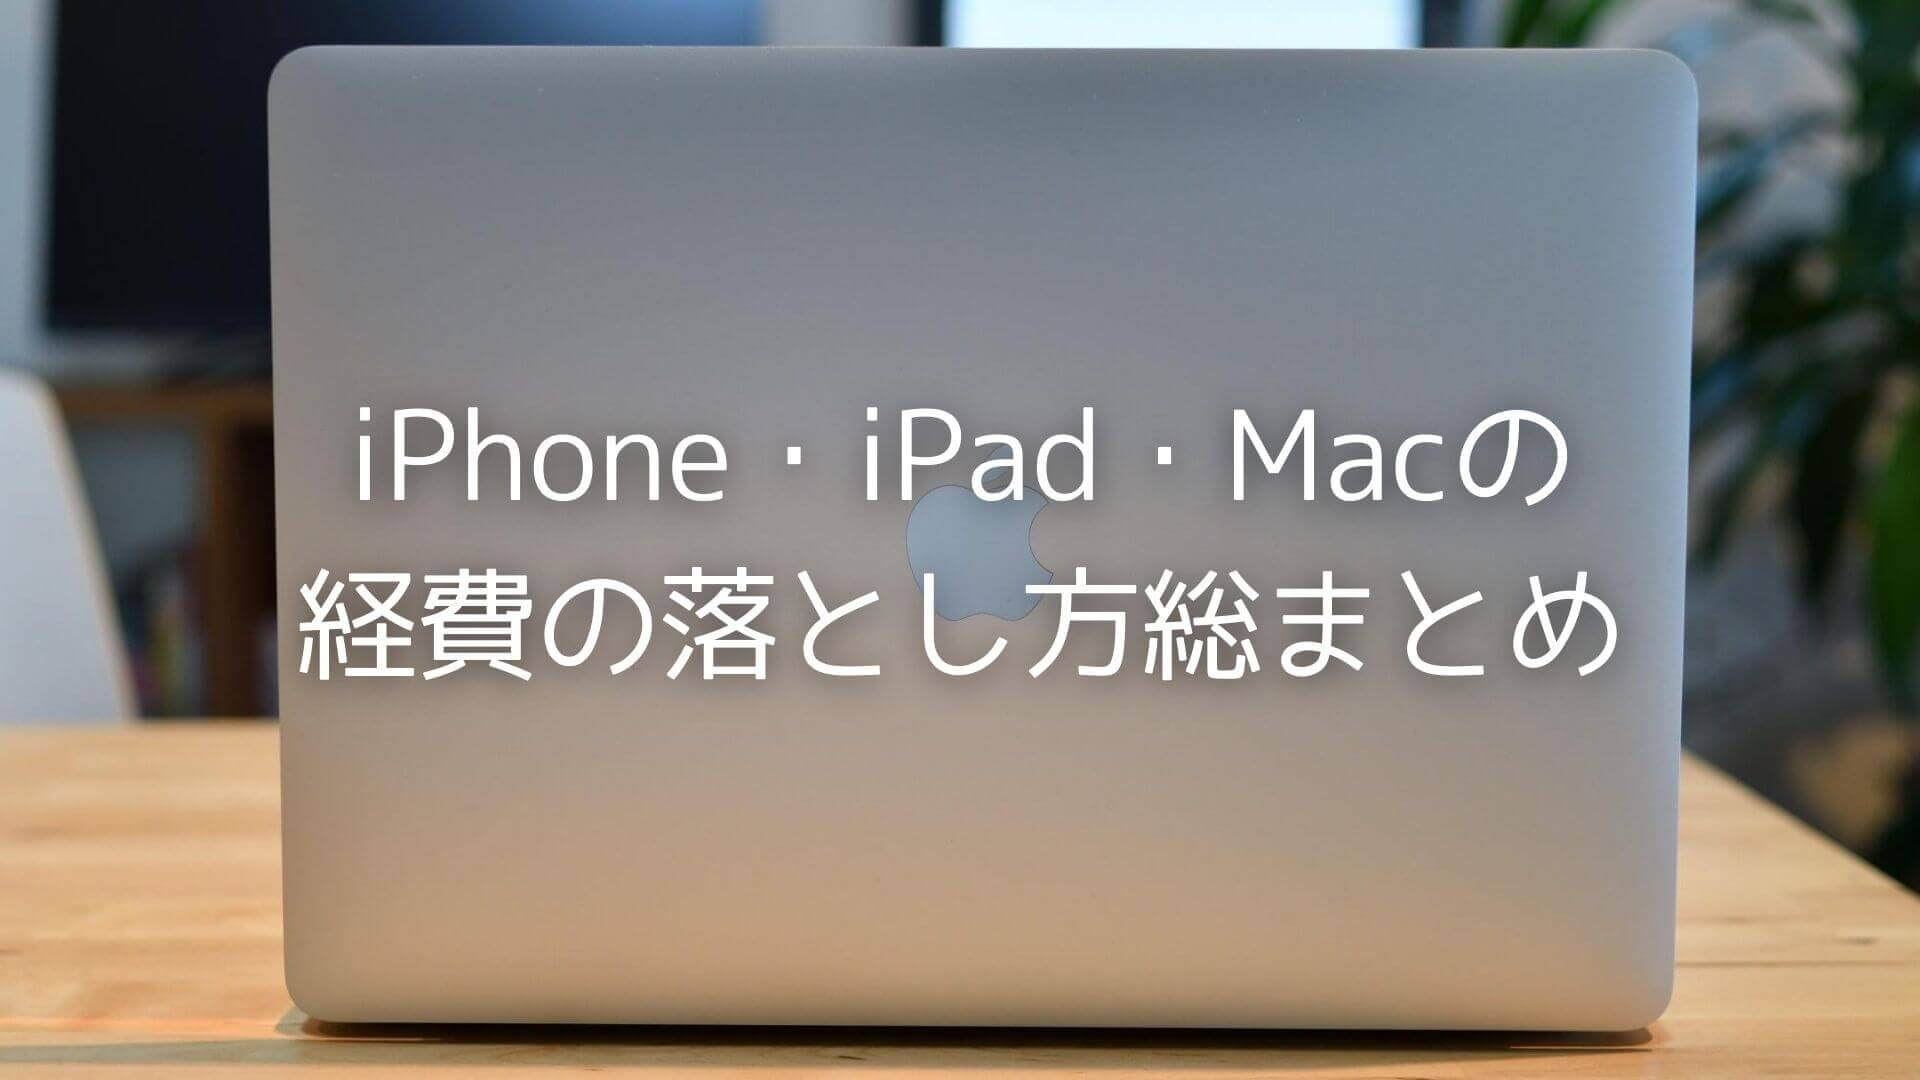 iPhone・iPad・Macの経費の落とし方総まとめ